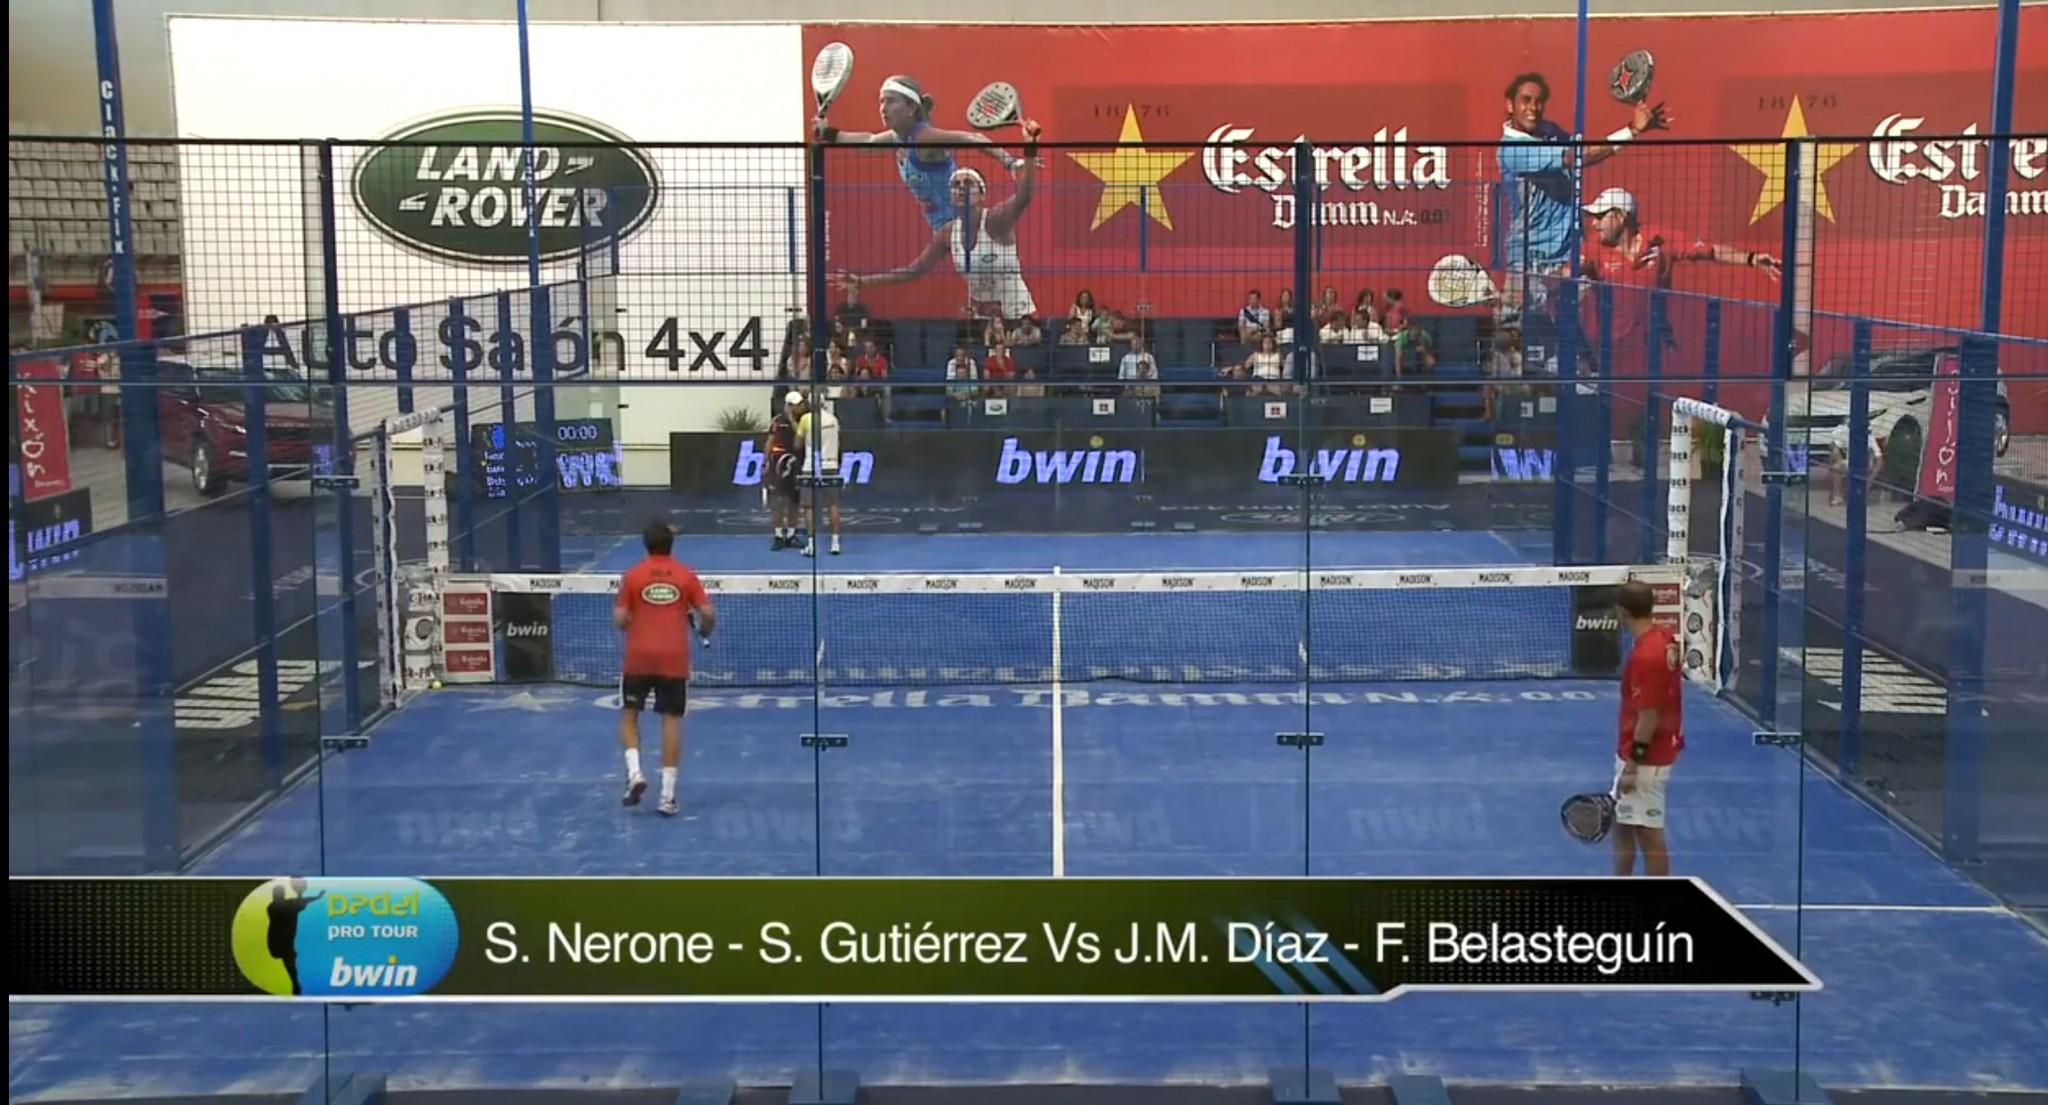 Padelpro Tour GIjon 2012 finale :S. Nerone – S. Gutiérrez Vs J.M. Díaz – F. Belasteguín